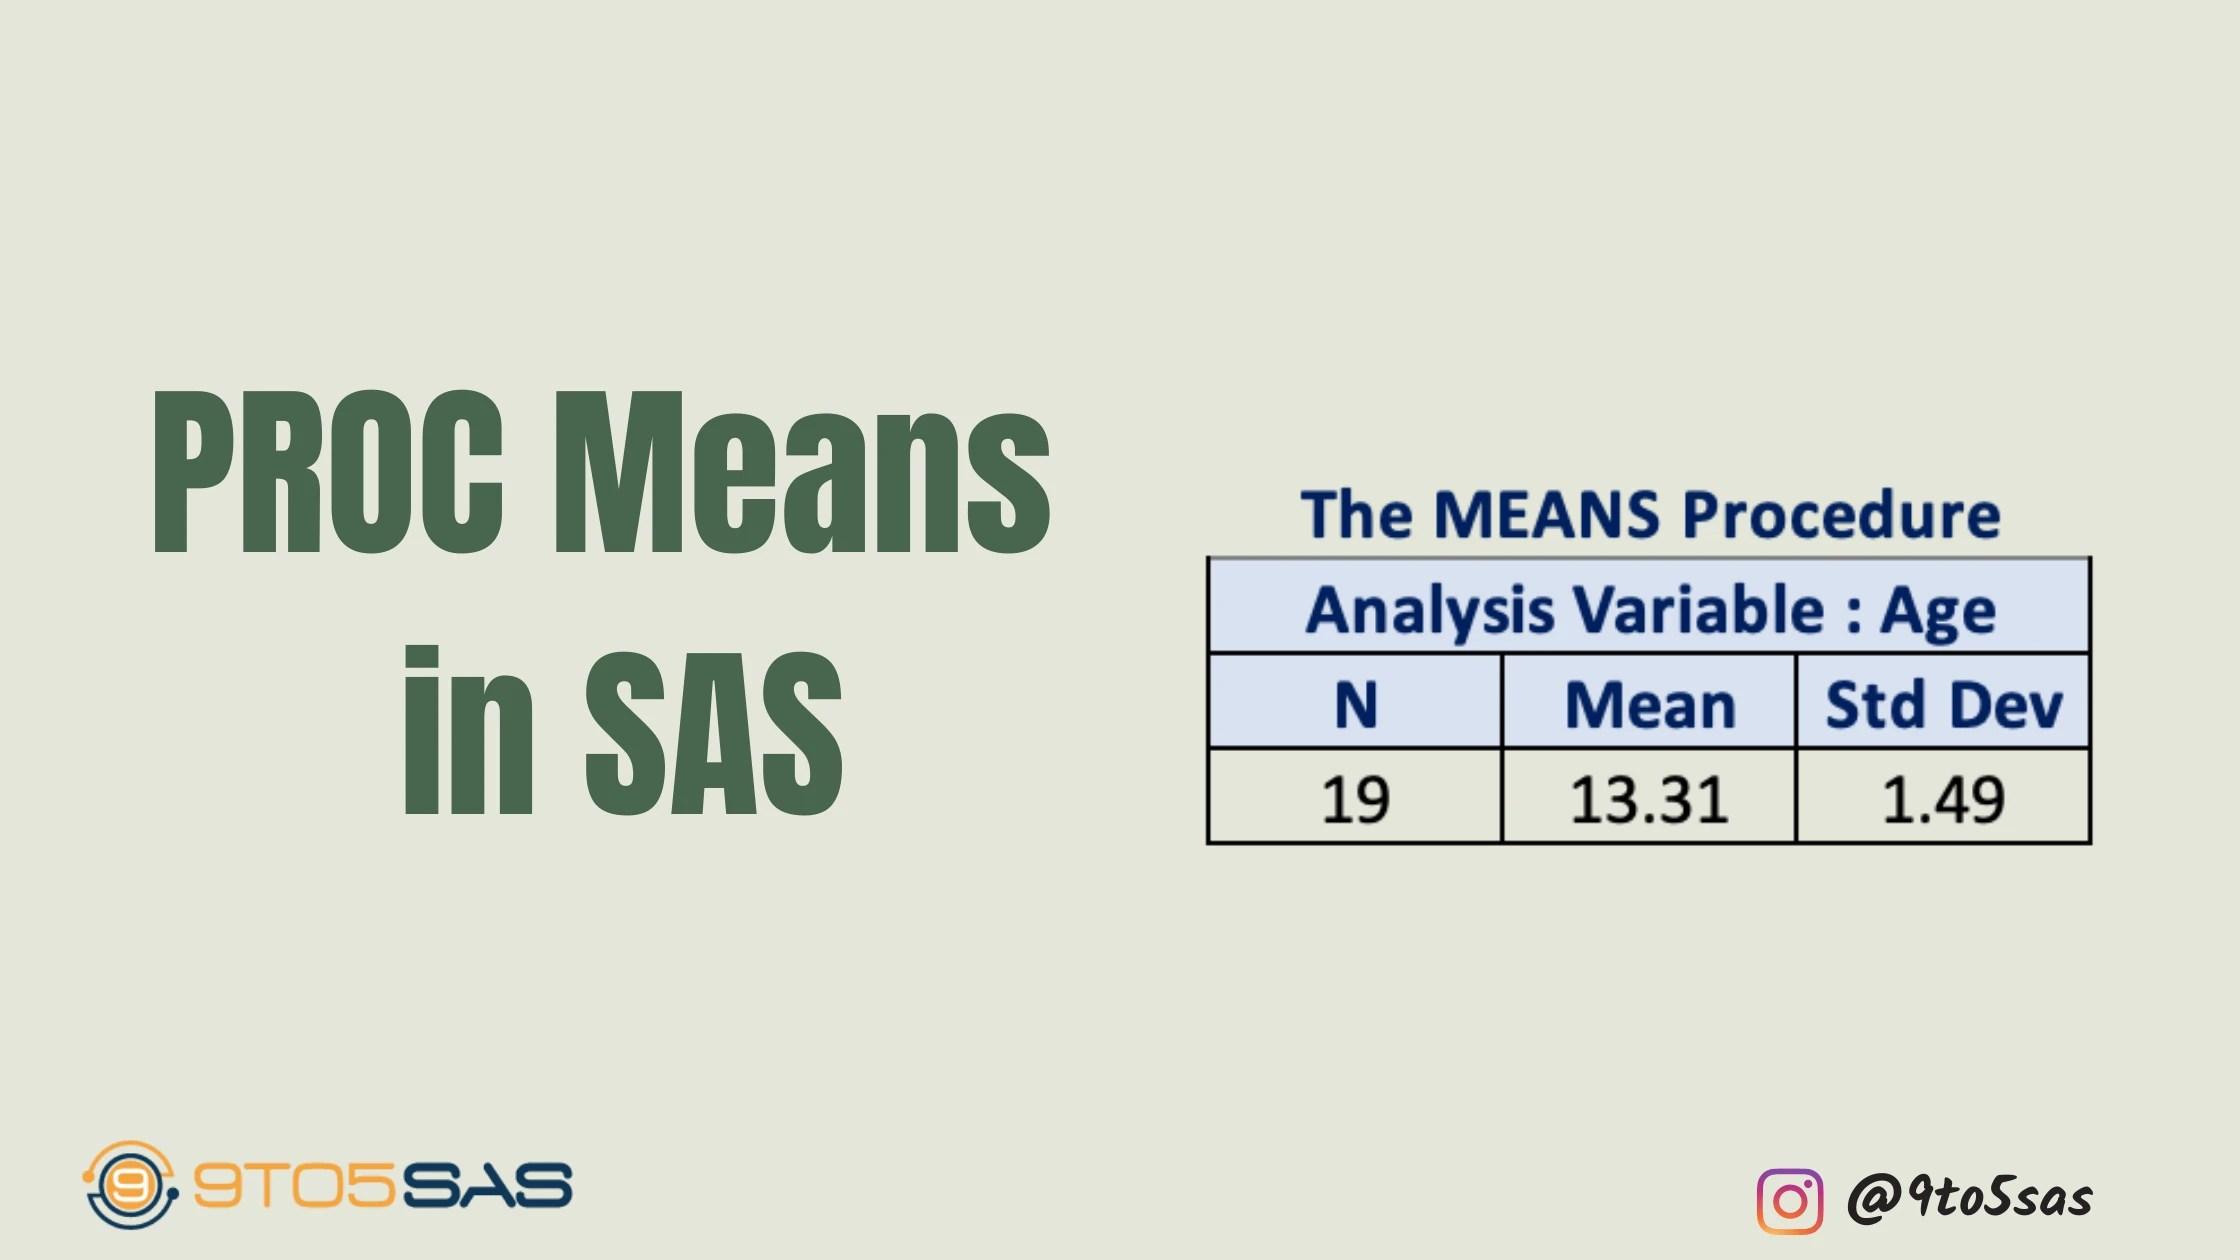 Proc Means in SAS